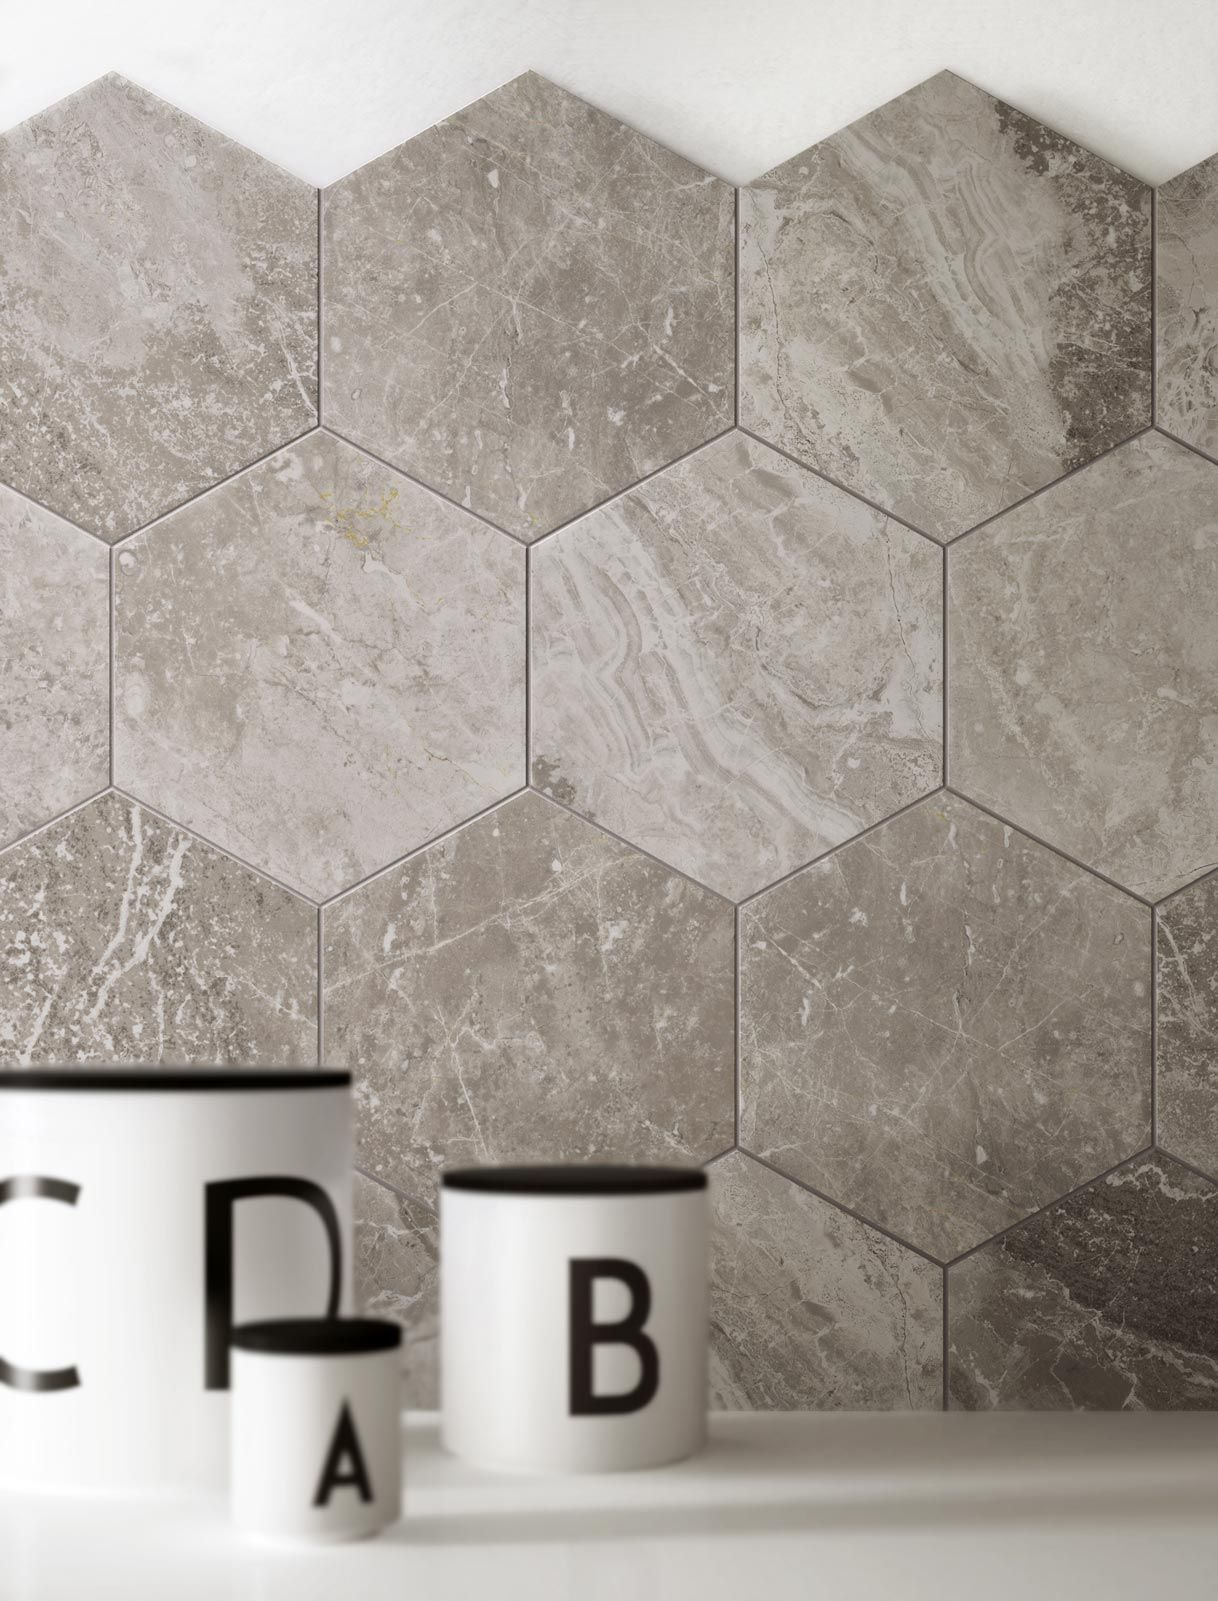 Cucina, tub tile and bistros on pinterest